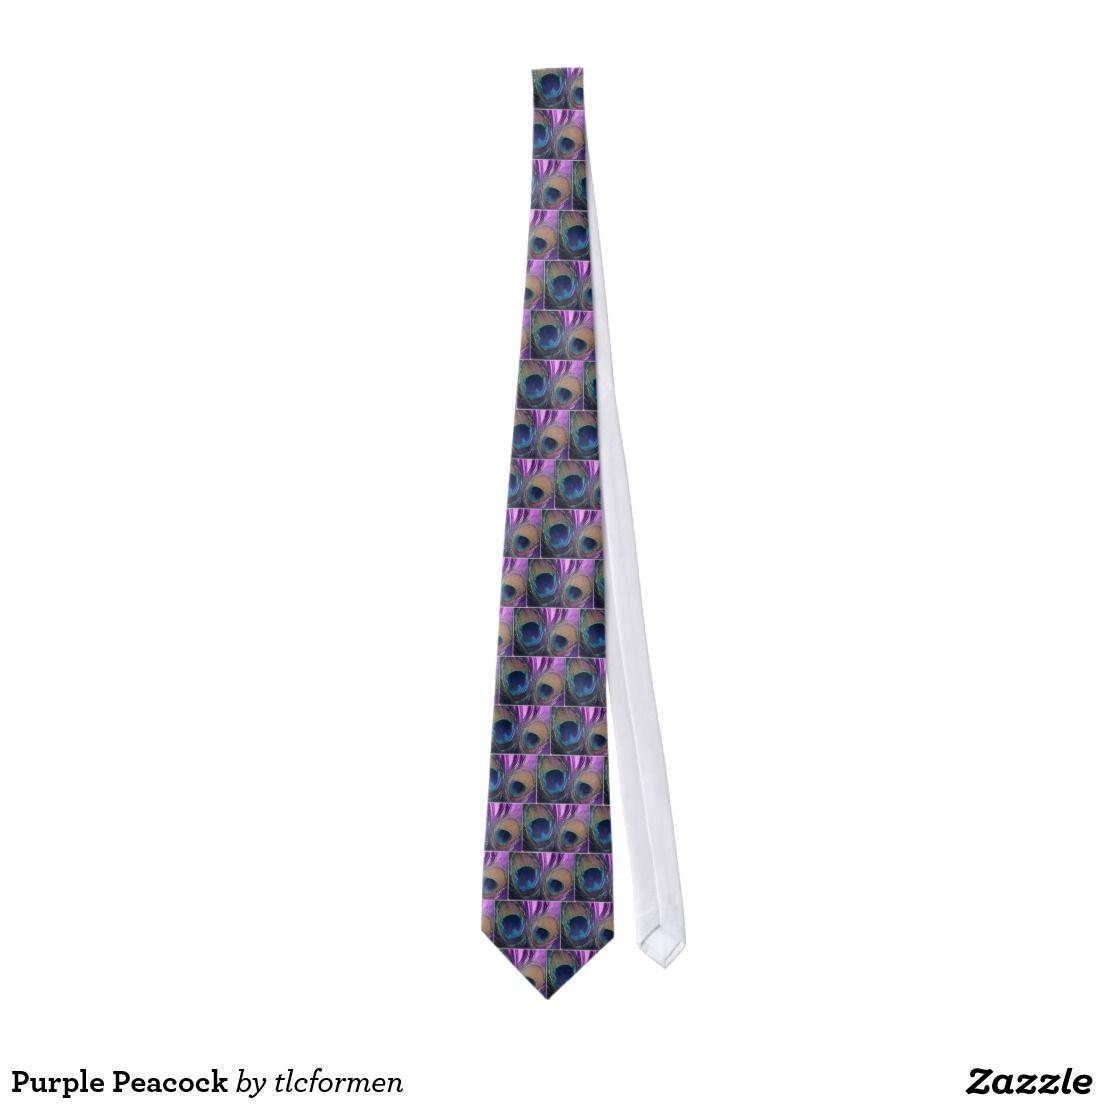 Purple Peacock Tie